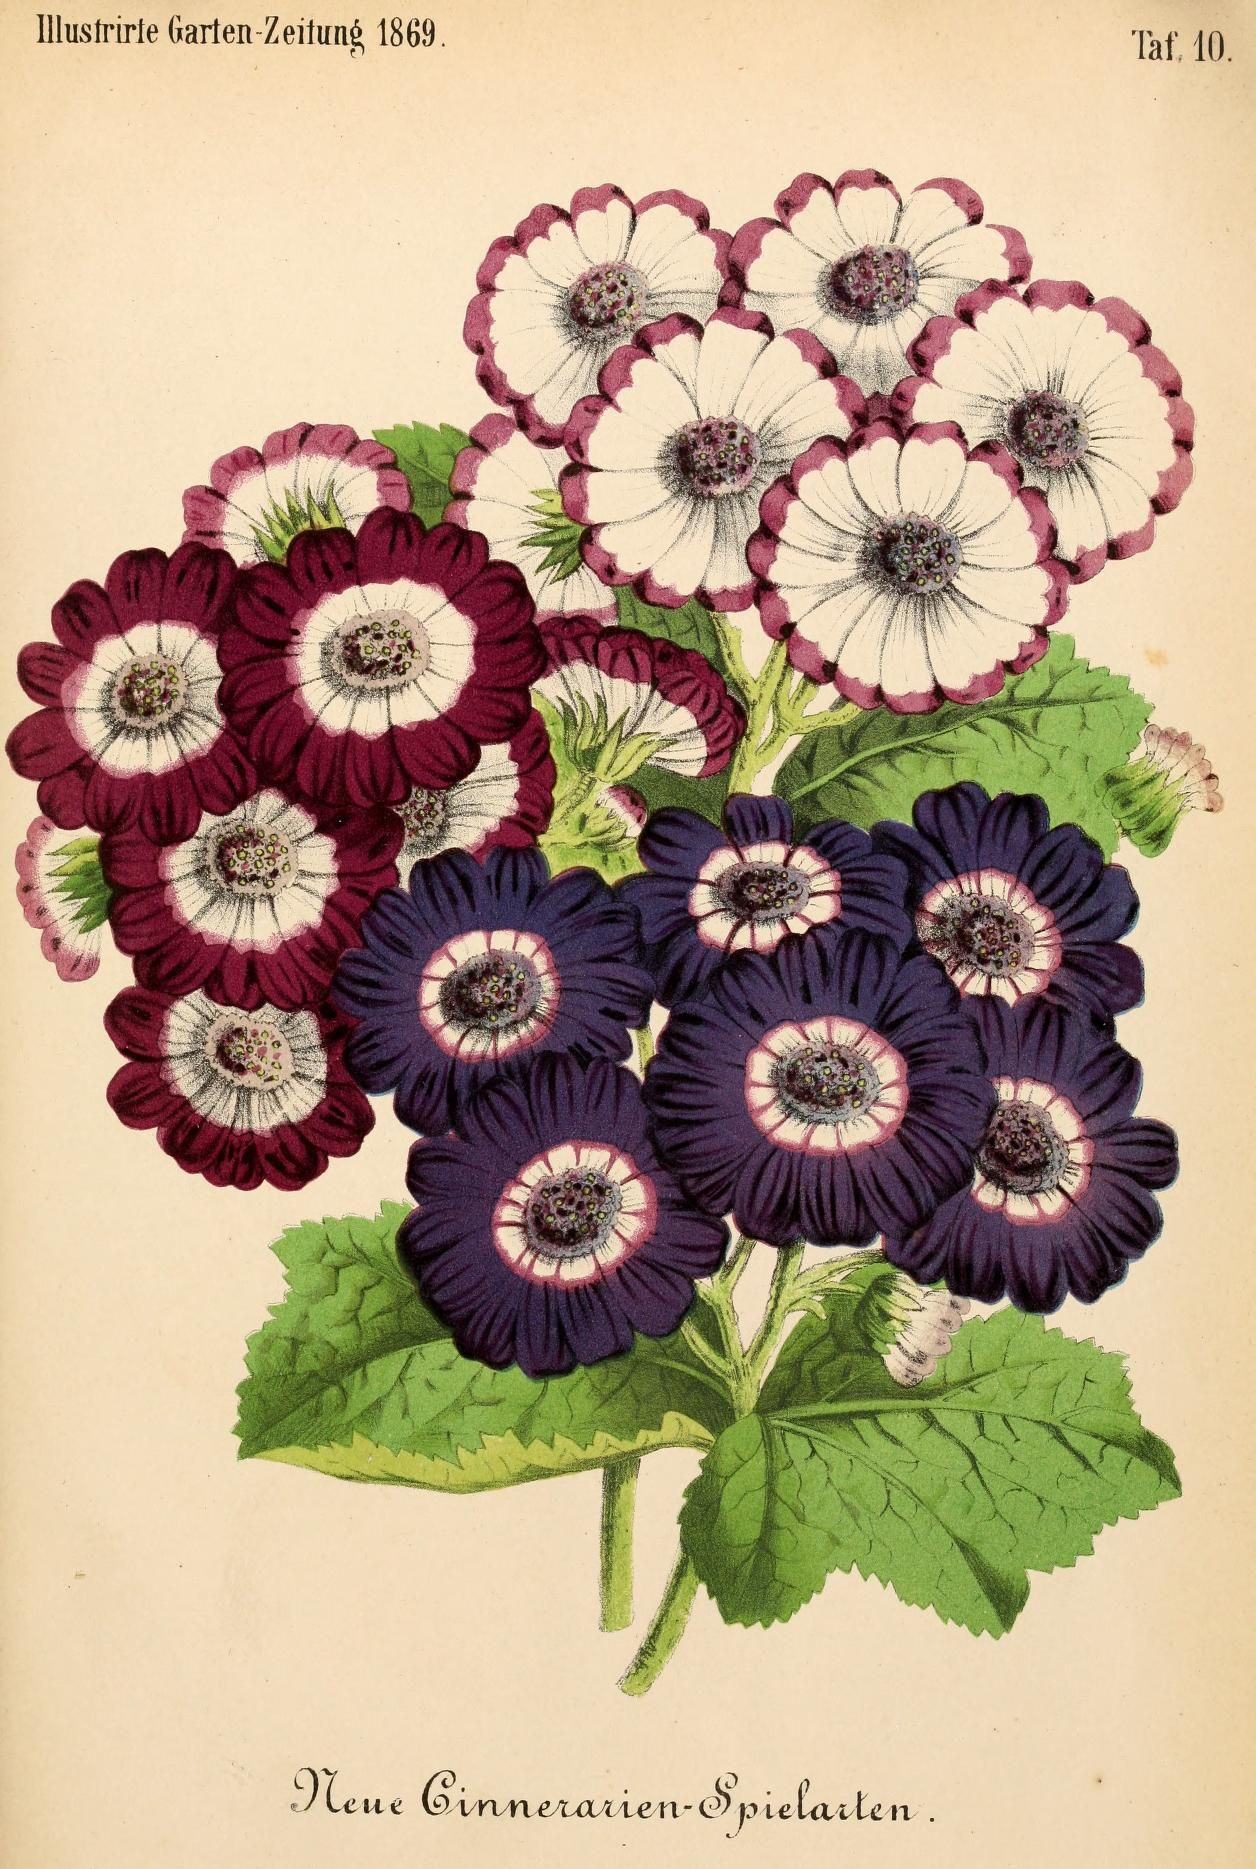 Bd 13 1869 Illustrierte Garten Zeitung Biodiversity Heritage Library Flower Art Botanical Illustration Blue Butterfly Wallpaper